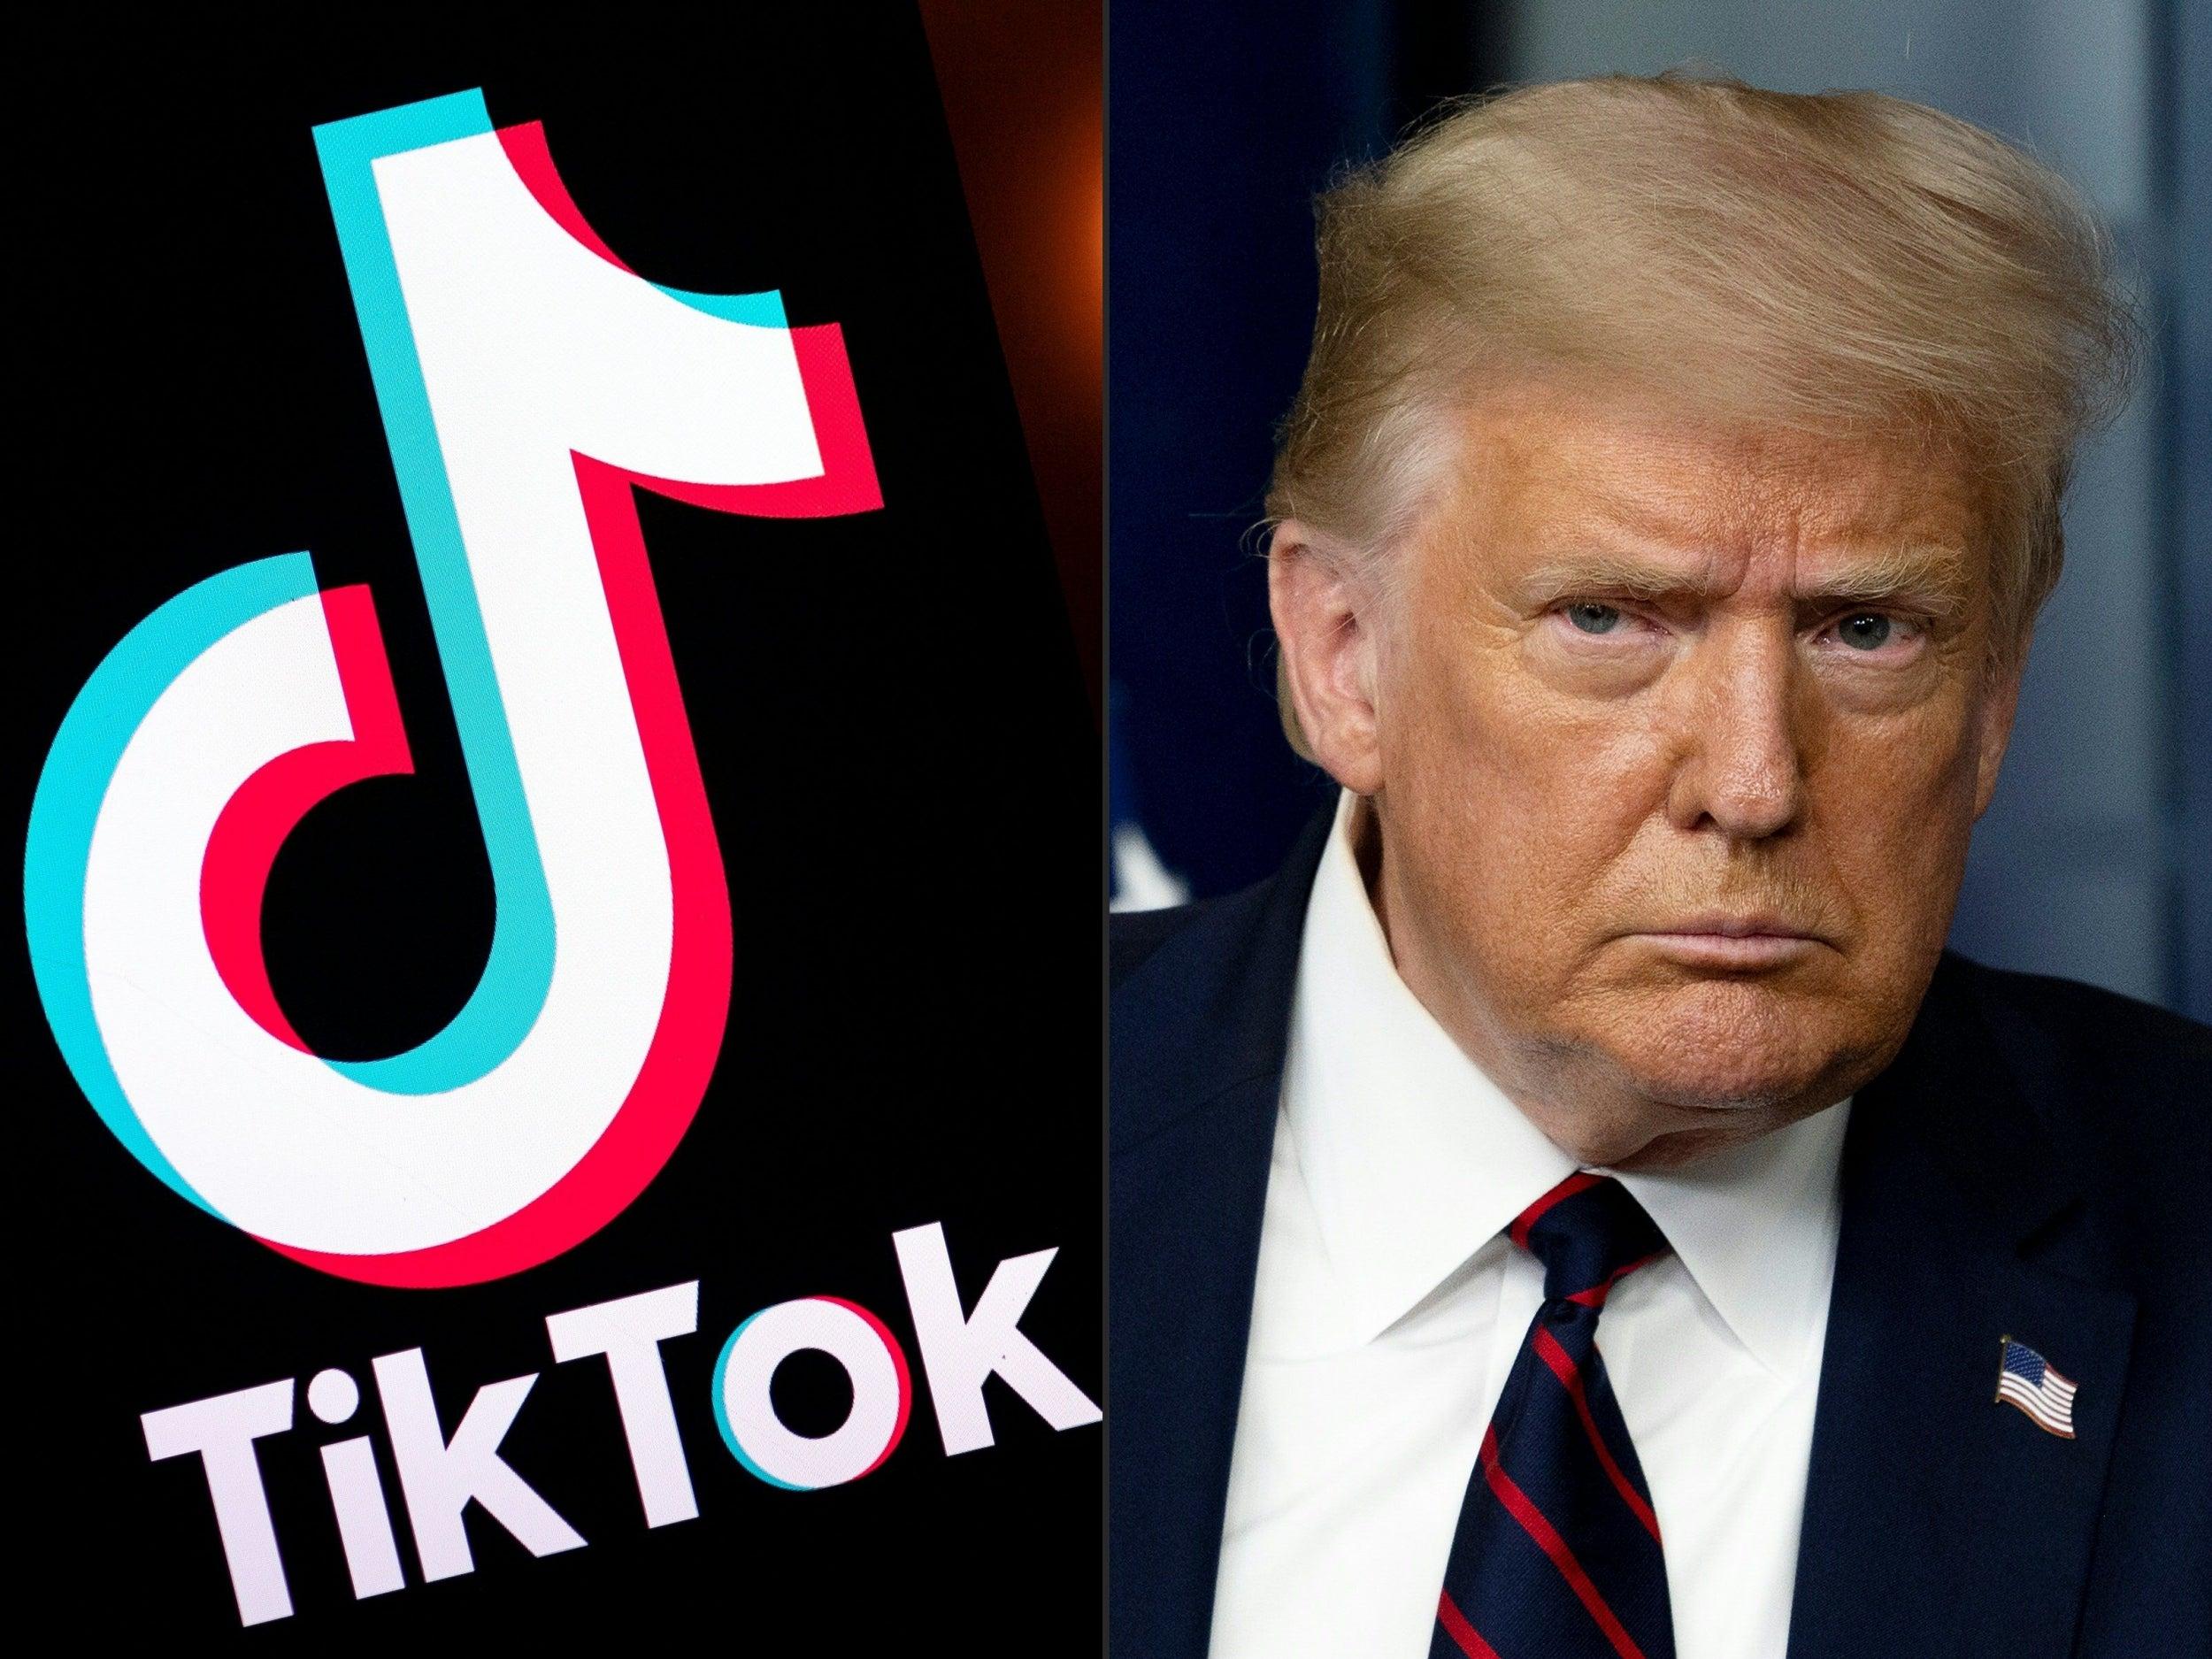 Trump Tik Tok